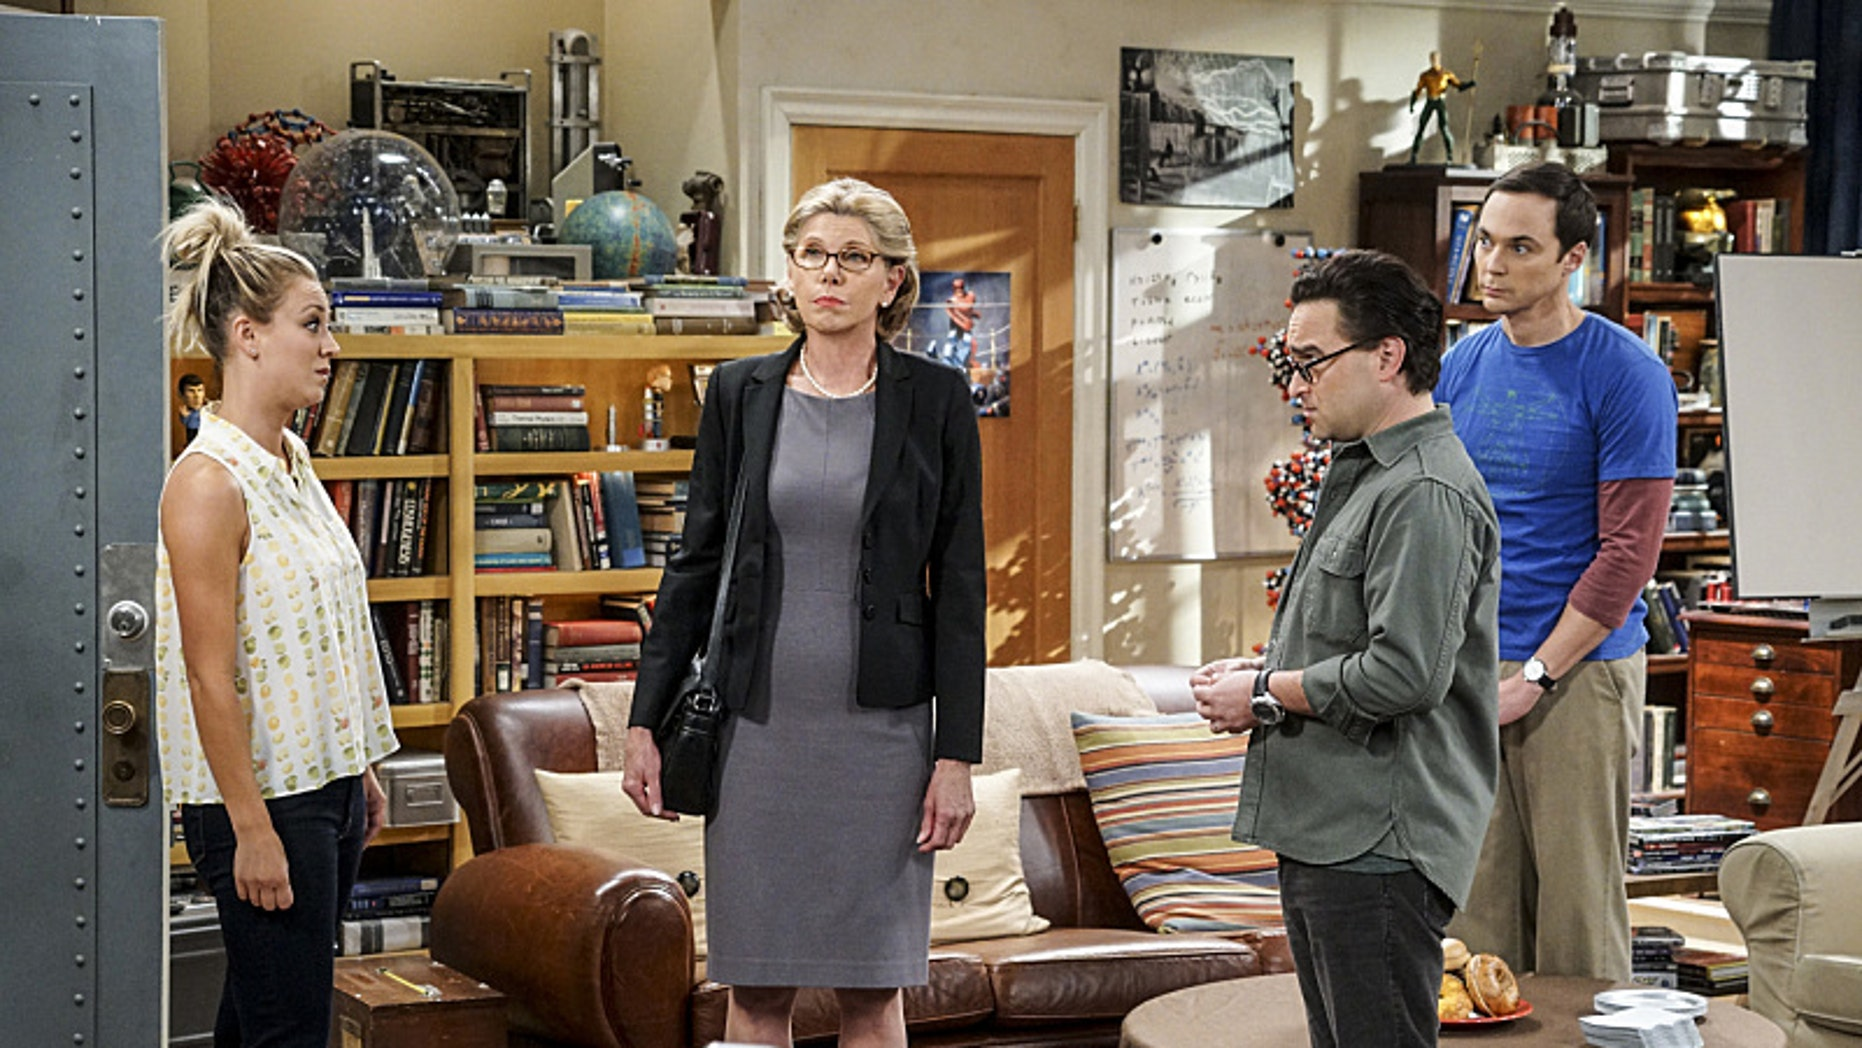 Pictured: Penny (Kaley Cuoco), Beverly (Christine Baranski), Leonard Hofstadter (Johnny Galecki), and Sheldon Cooper (Jim Parsons).